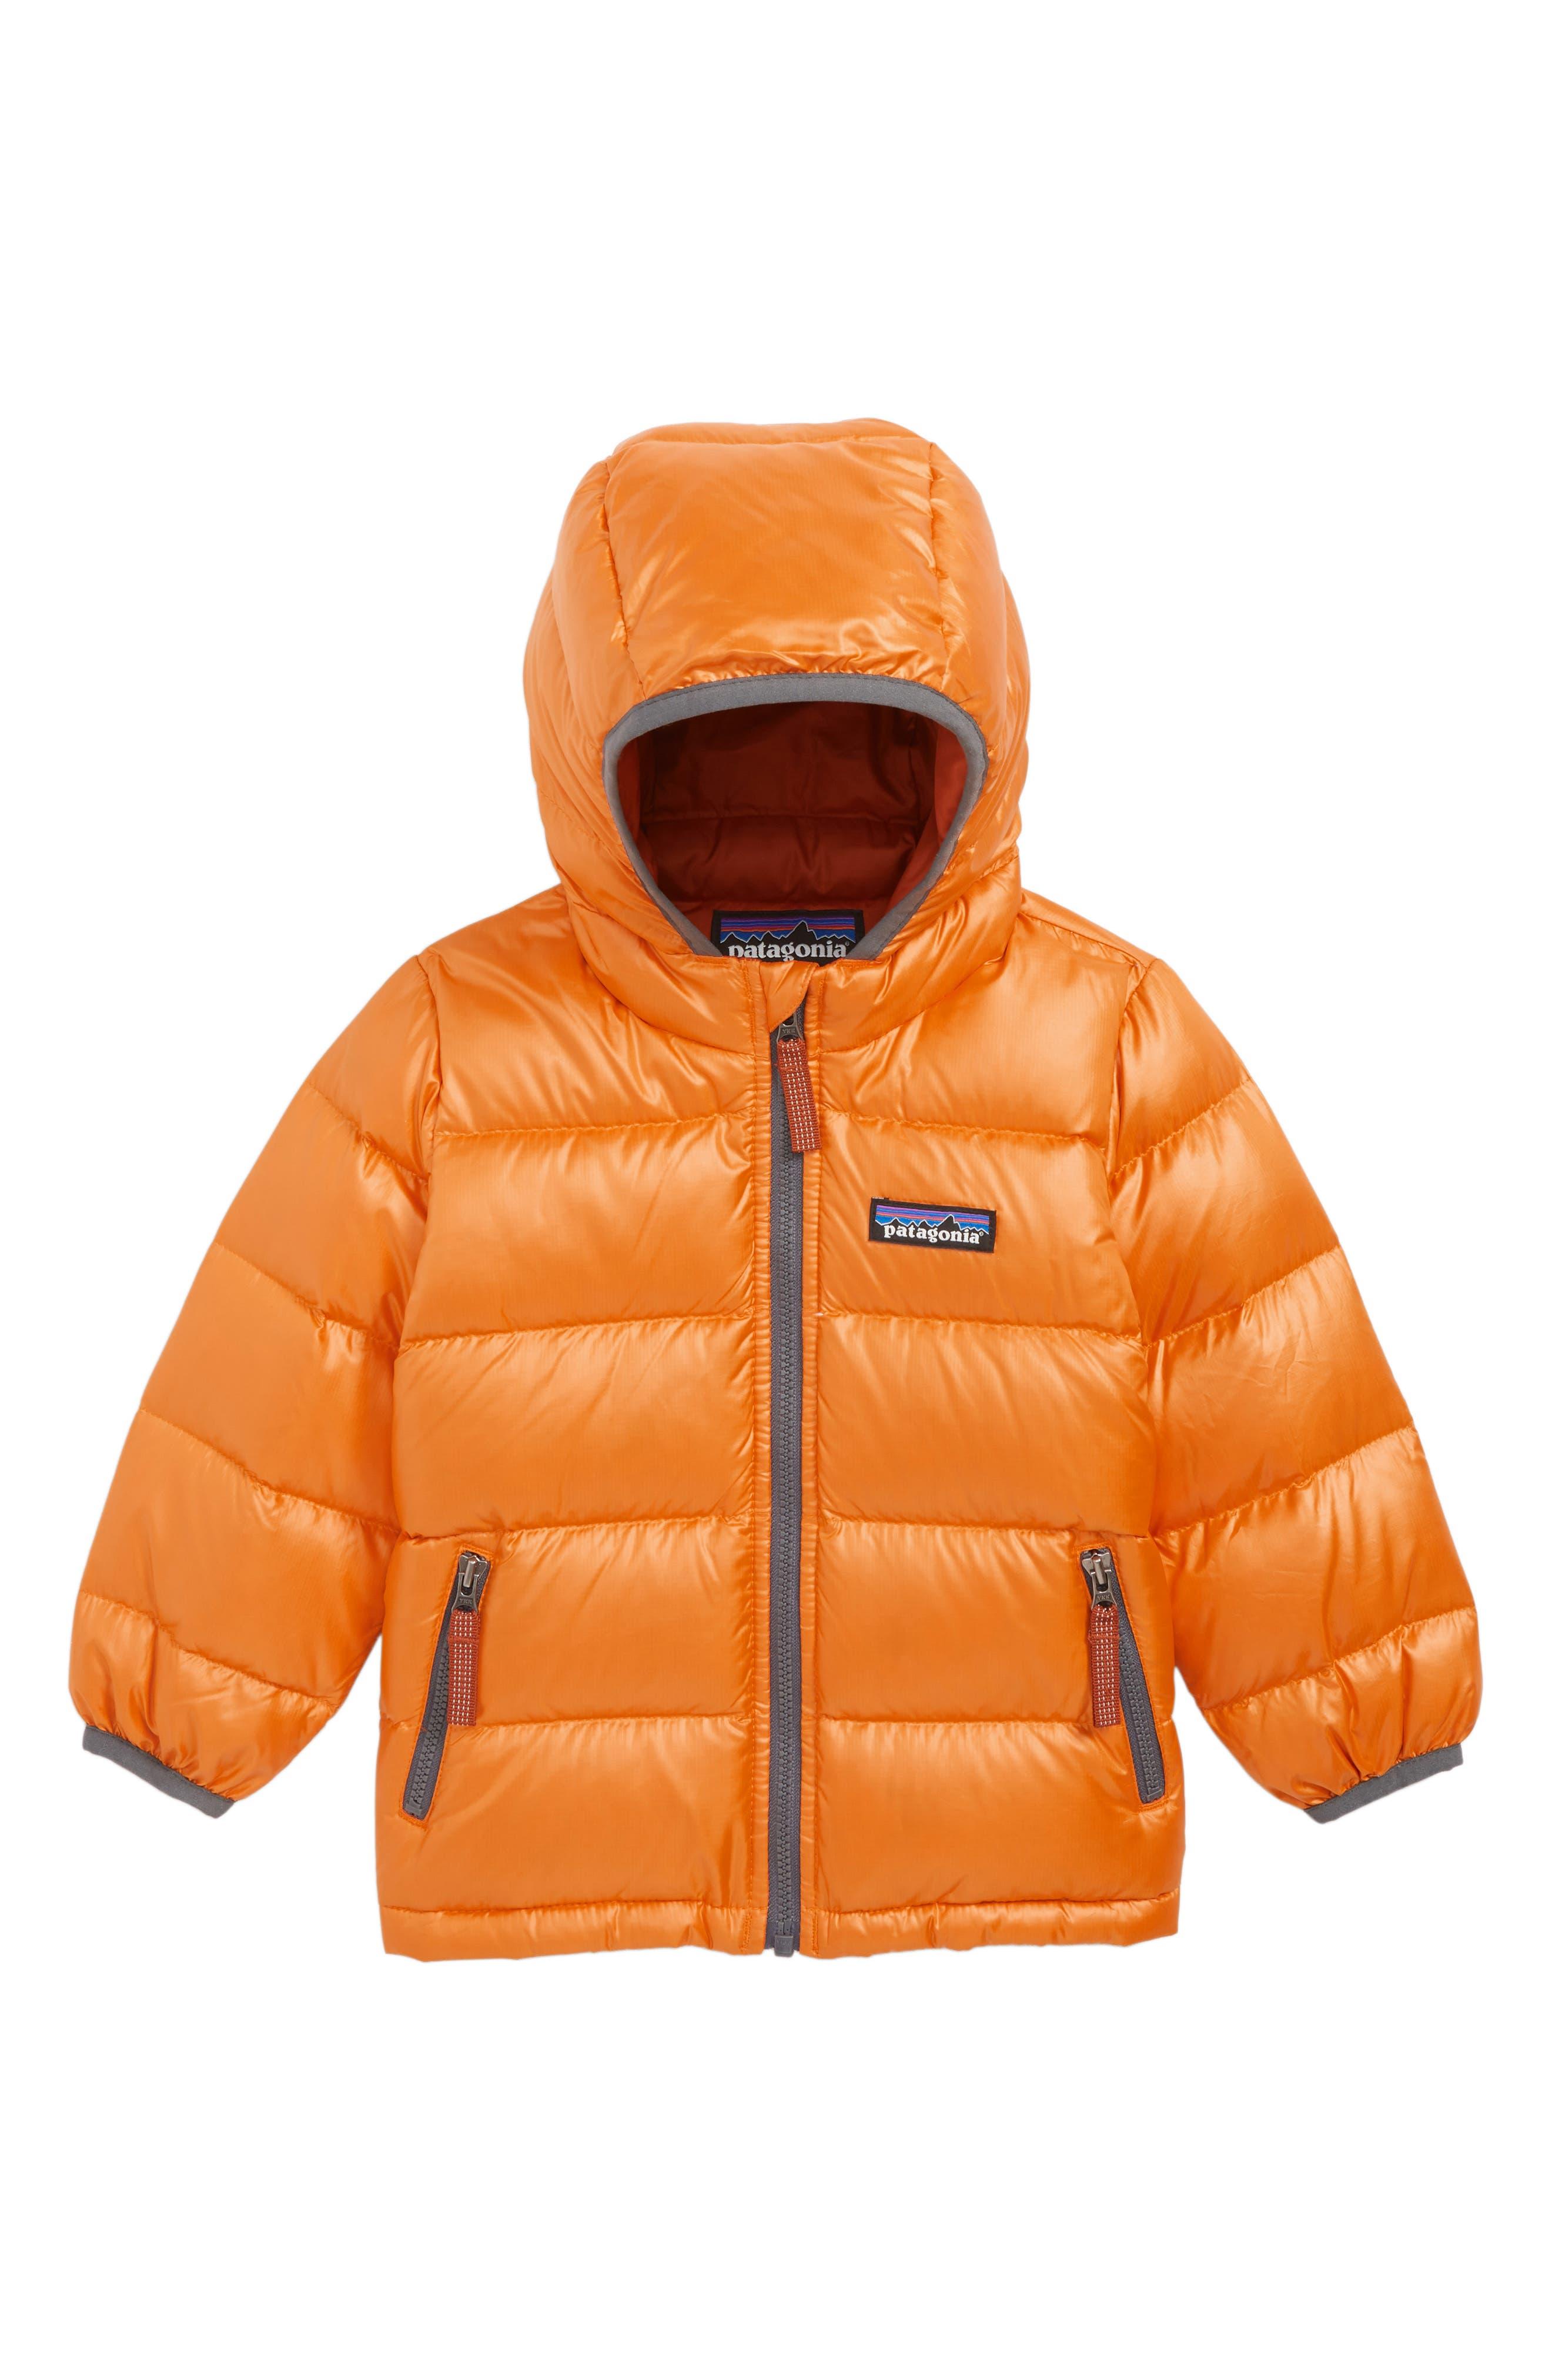 Infant Boys Patagonia HiLoft WaterRepellent 600Fill Power Down Sweater Hoodie Size 612M  Orange